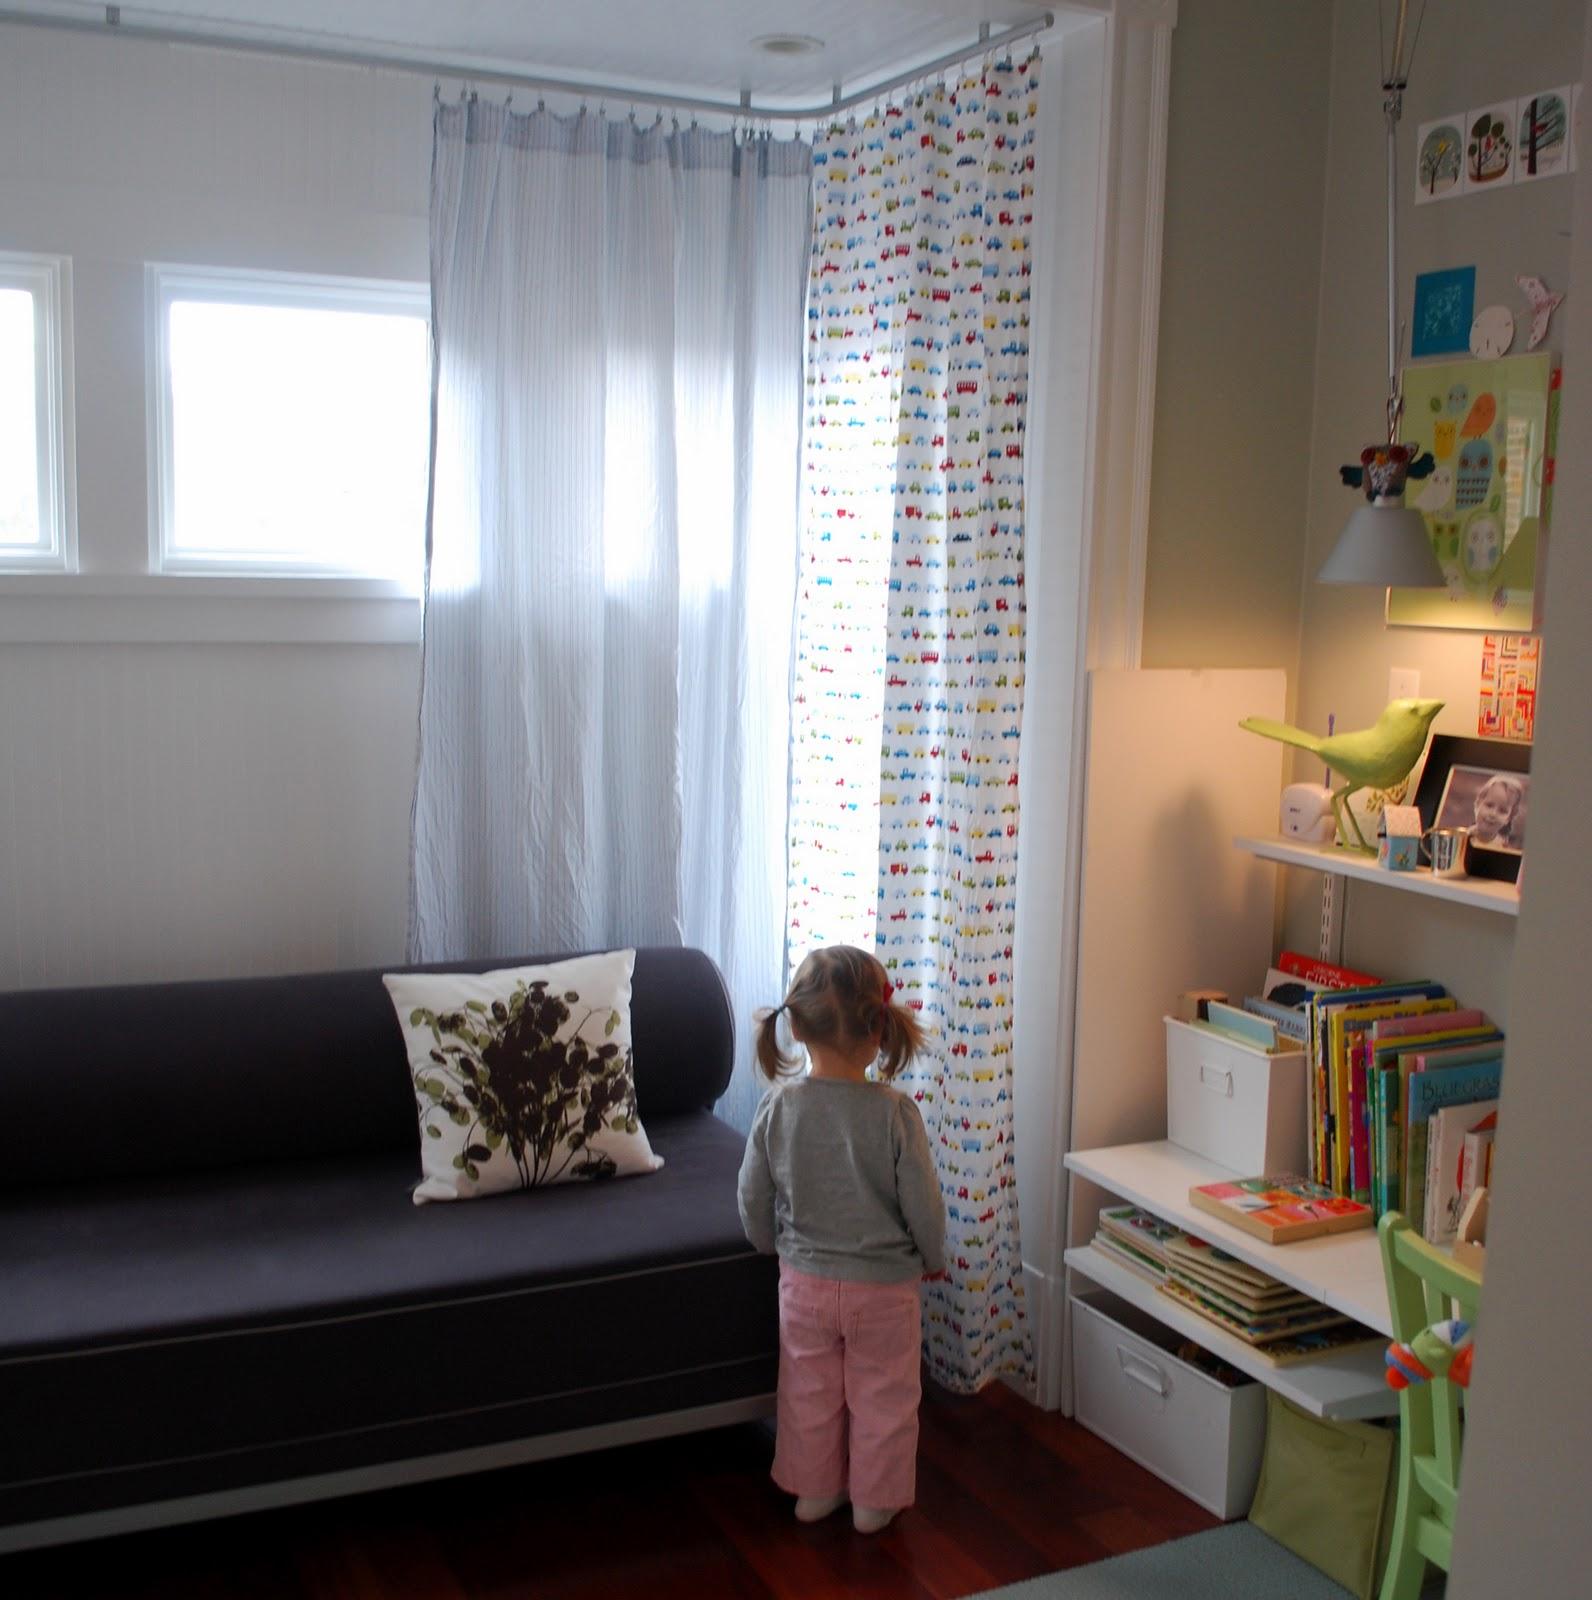 Ikea curtains kvartal - Daily Archives November 6 2011